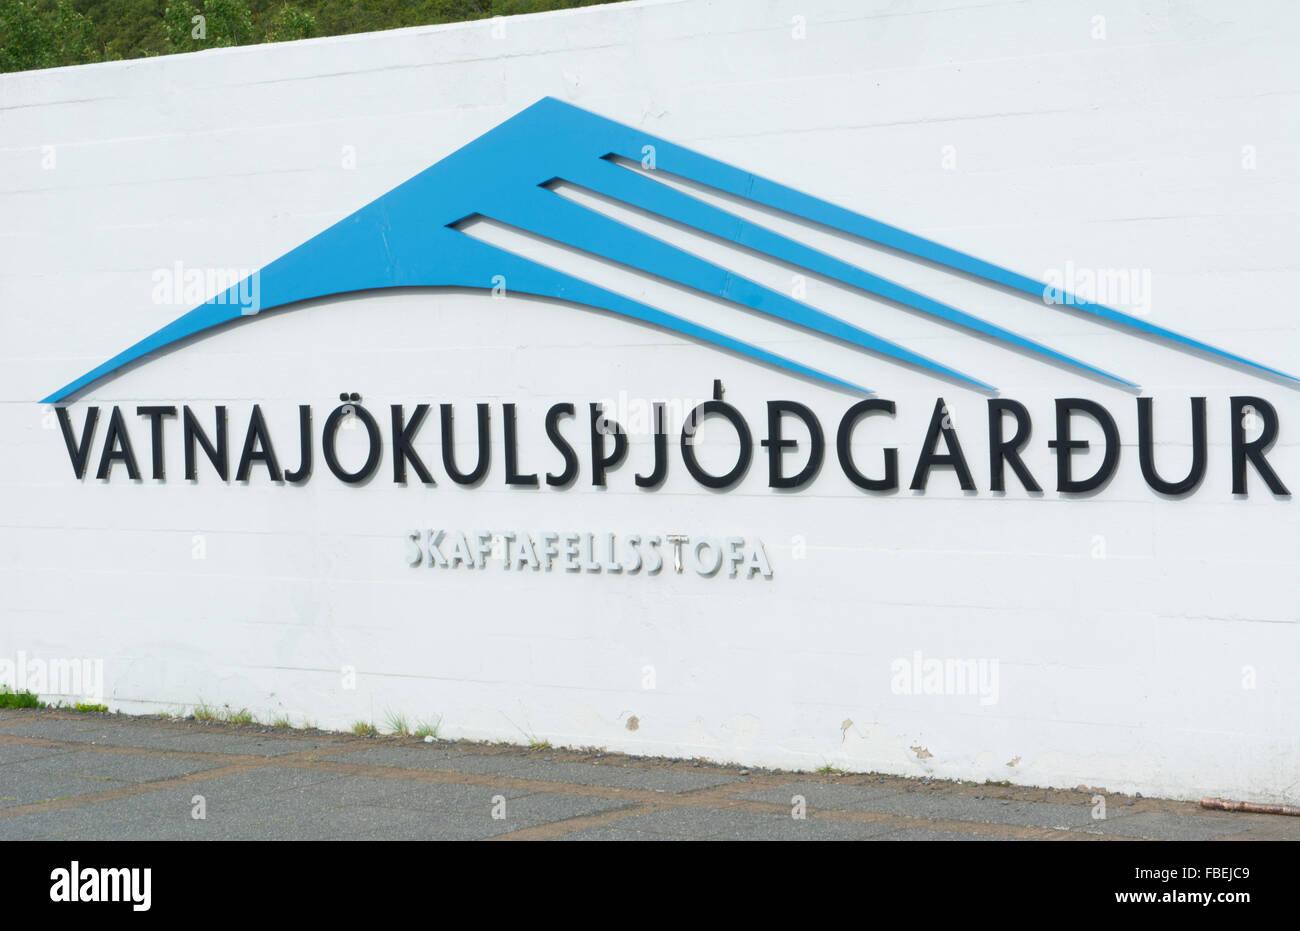 Iceland Vatnakulspjodardur signage - Stock Image